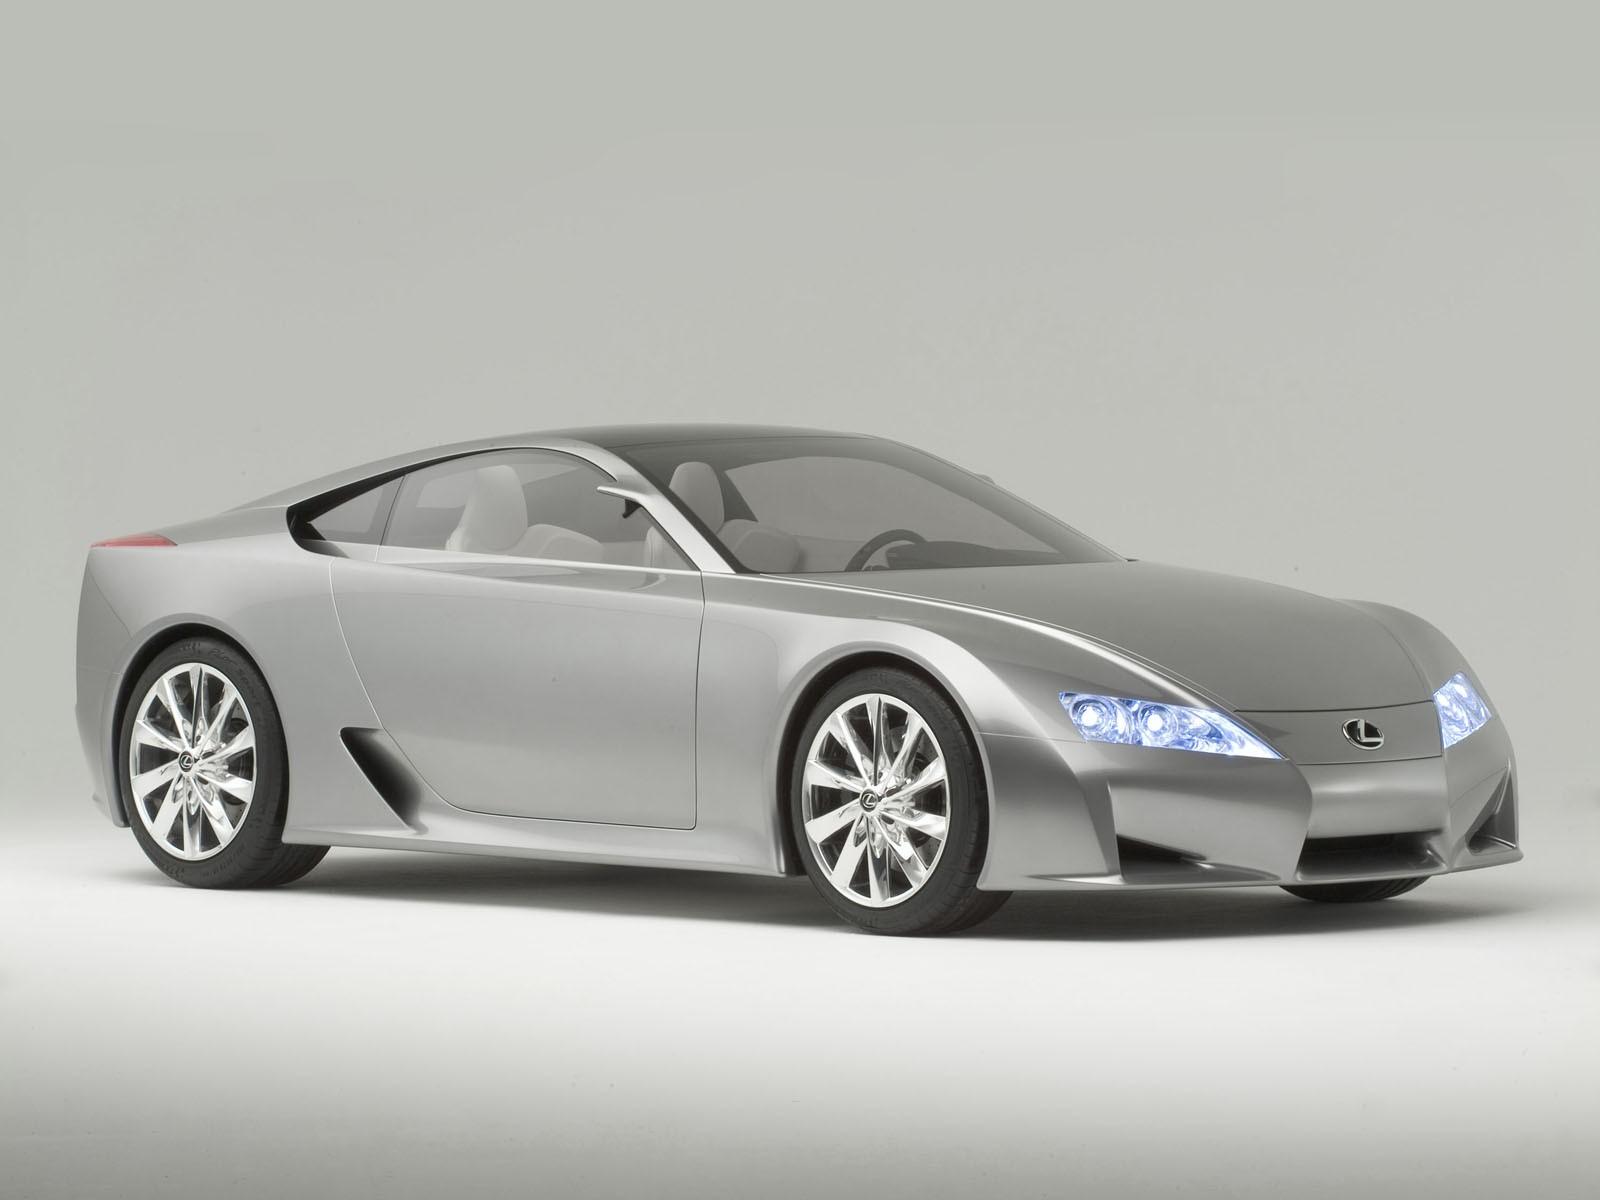 http://3.bp.blogspot.com/-o6cJHcFHOpE/TcOScJJrpiI/AAAAAAAABA0/Rz1YnEM0SxI/s1600/19036-Lexus-LFA-Concept.jpg